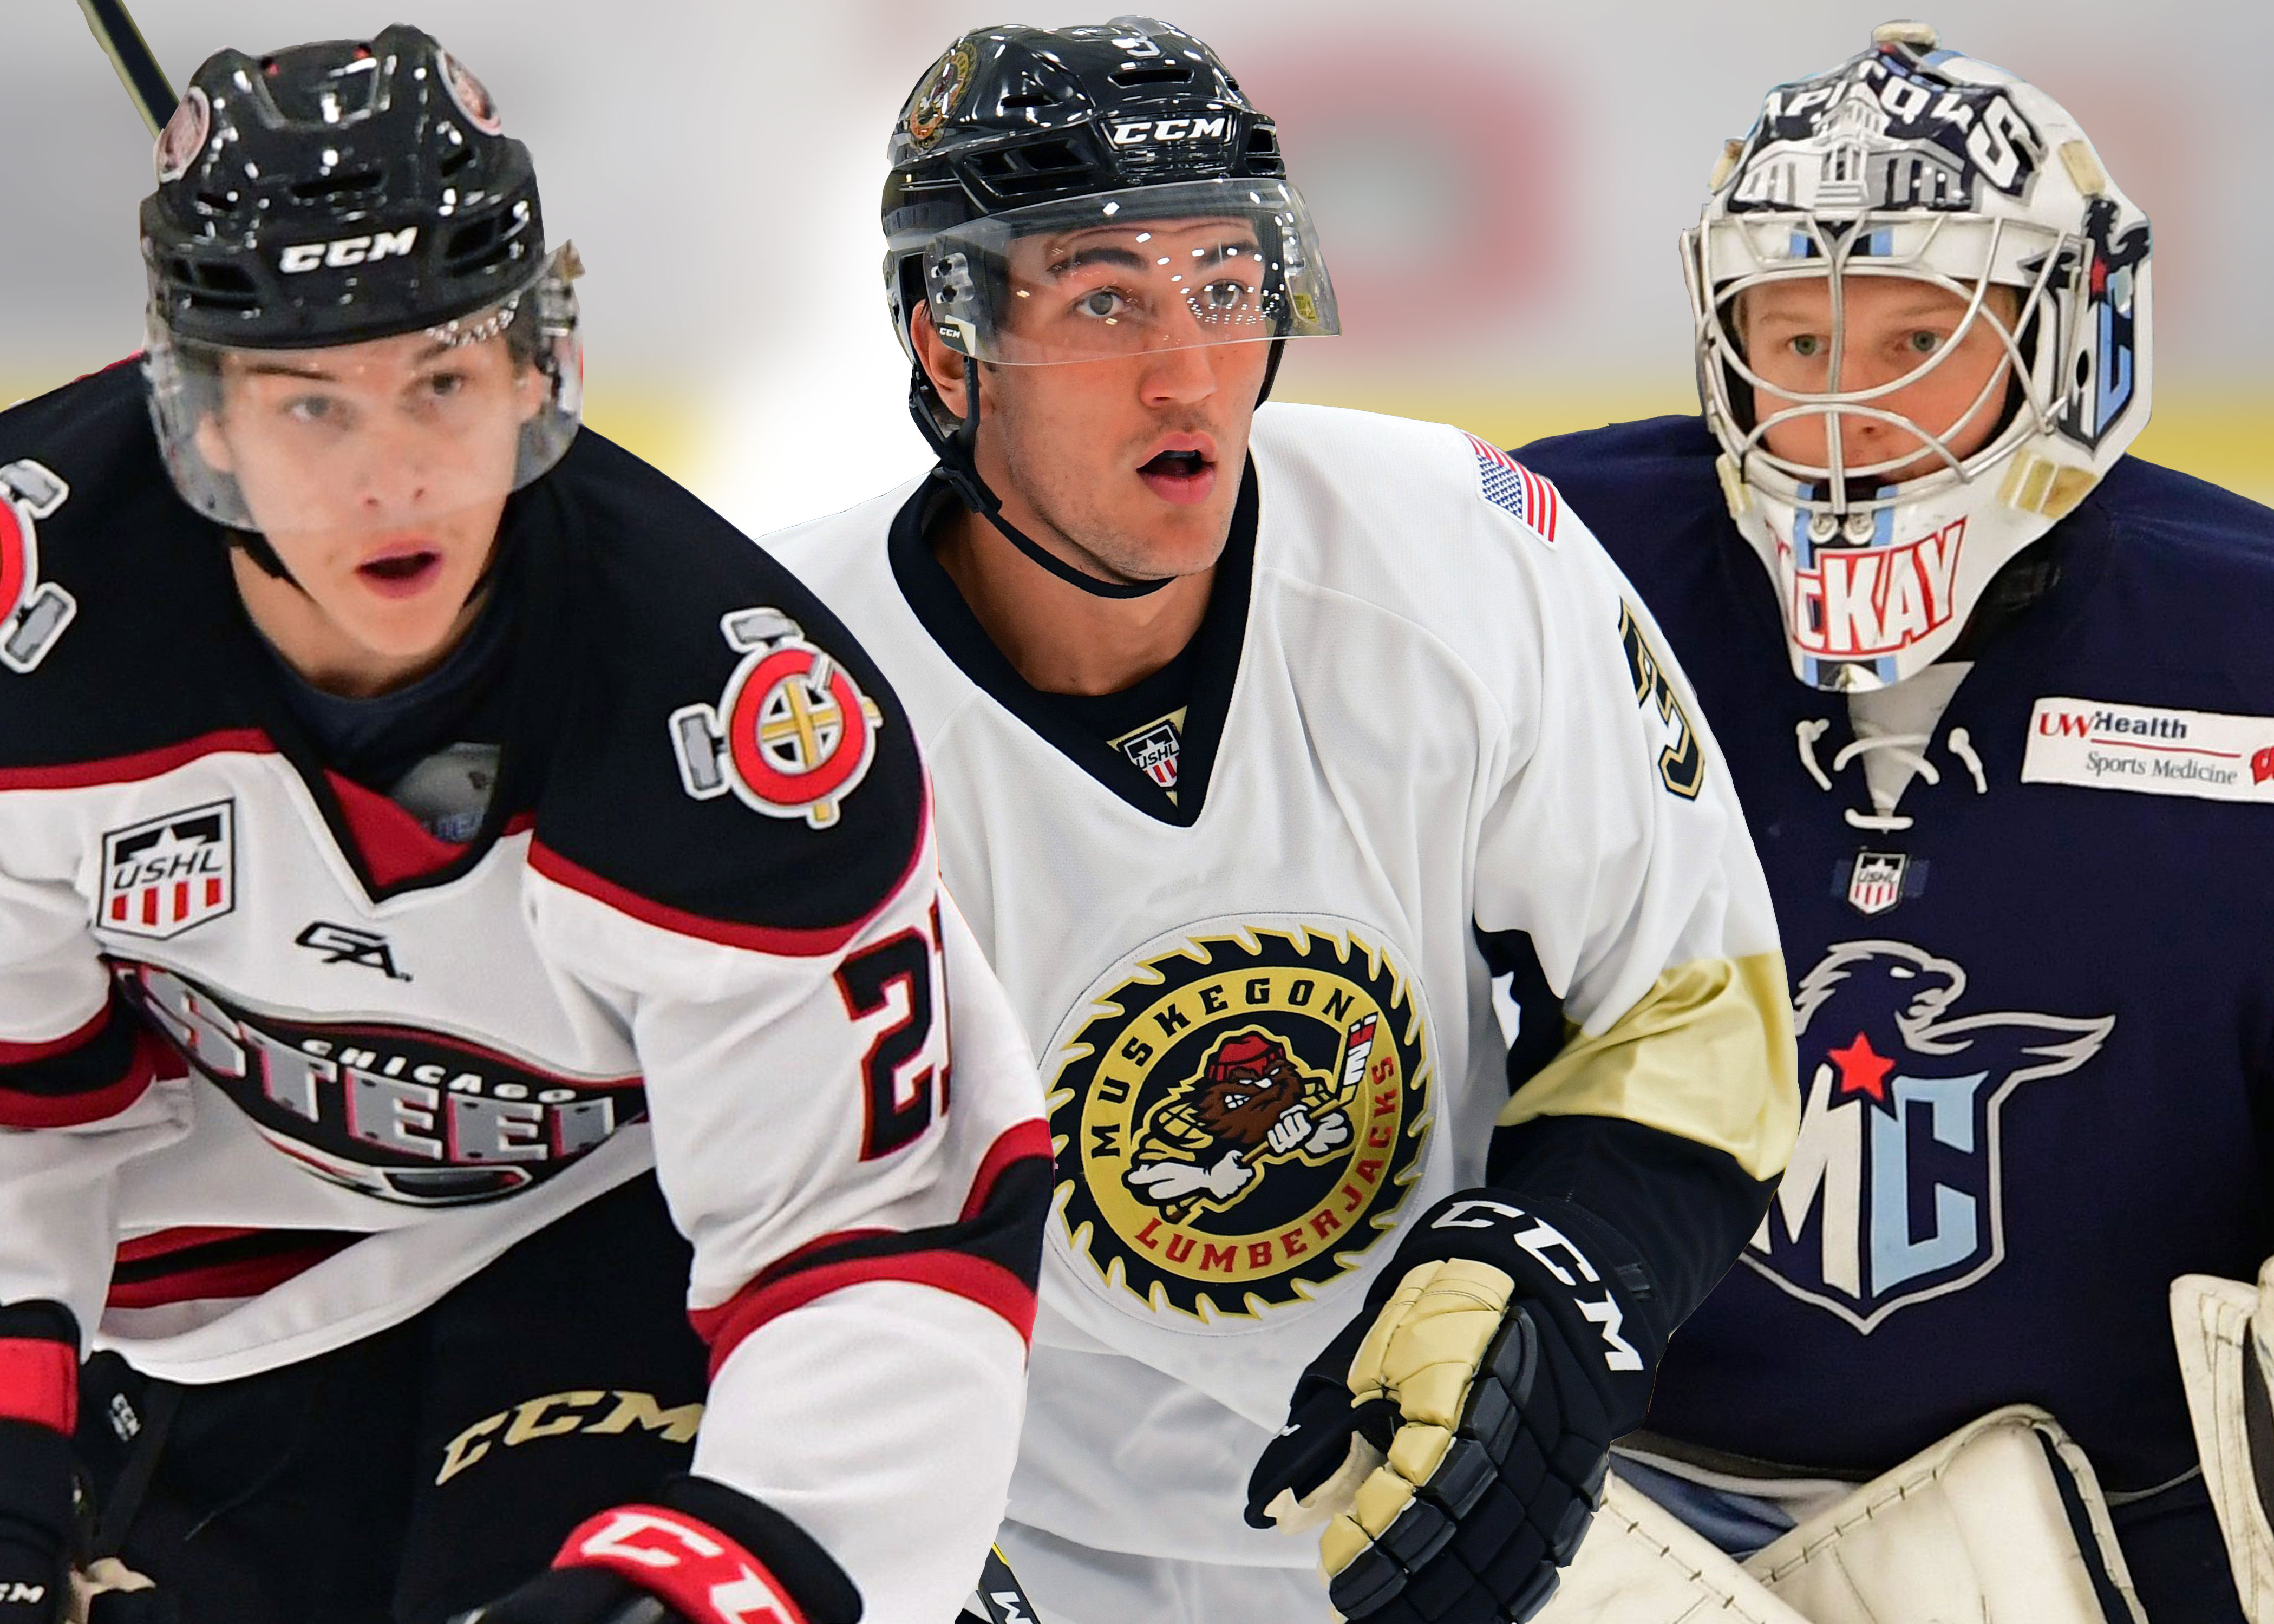 USHL: Players Of The Week - Week 15, 2017-18